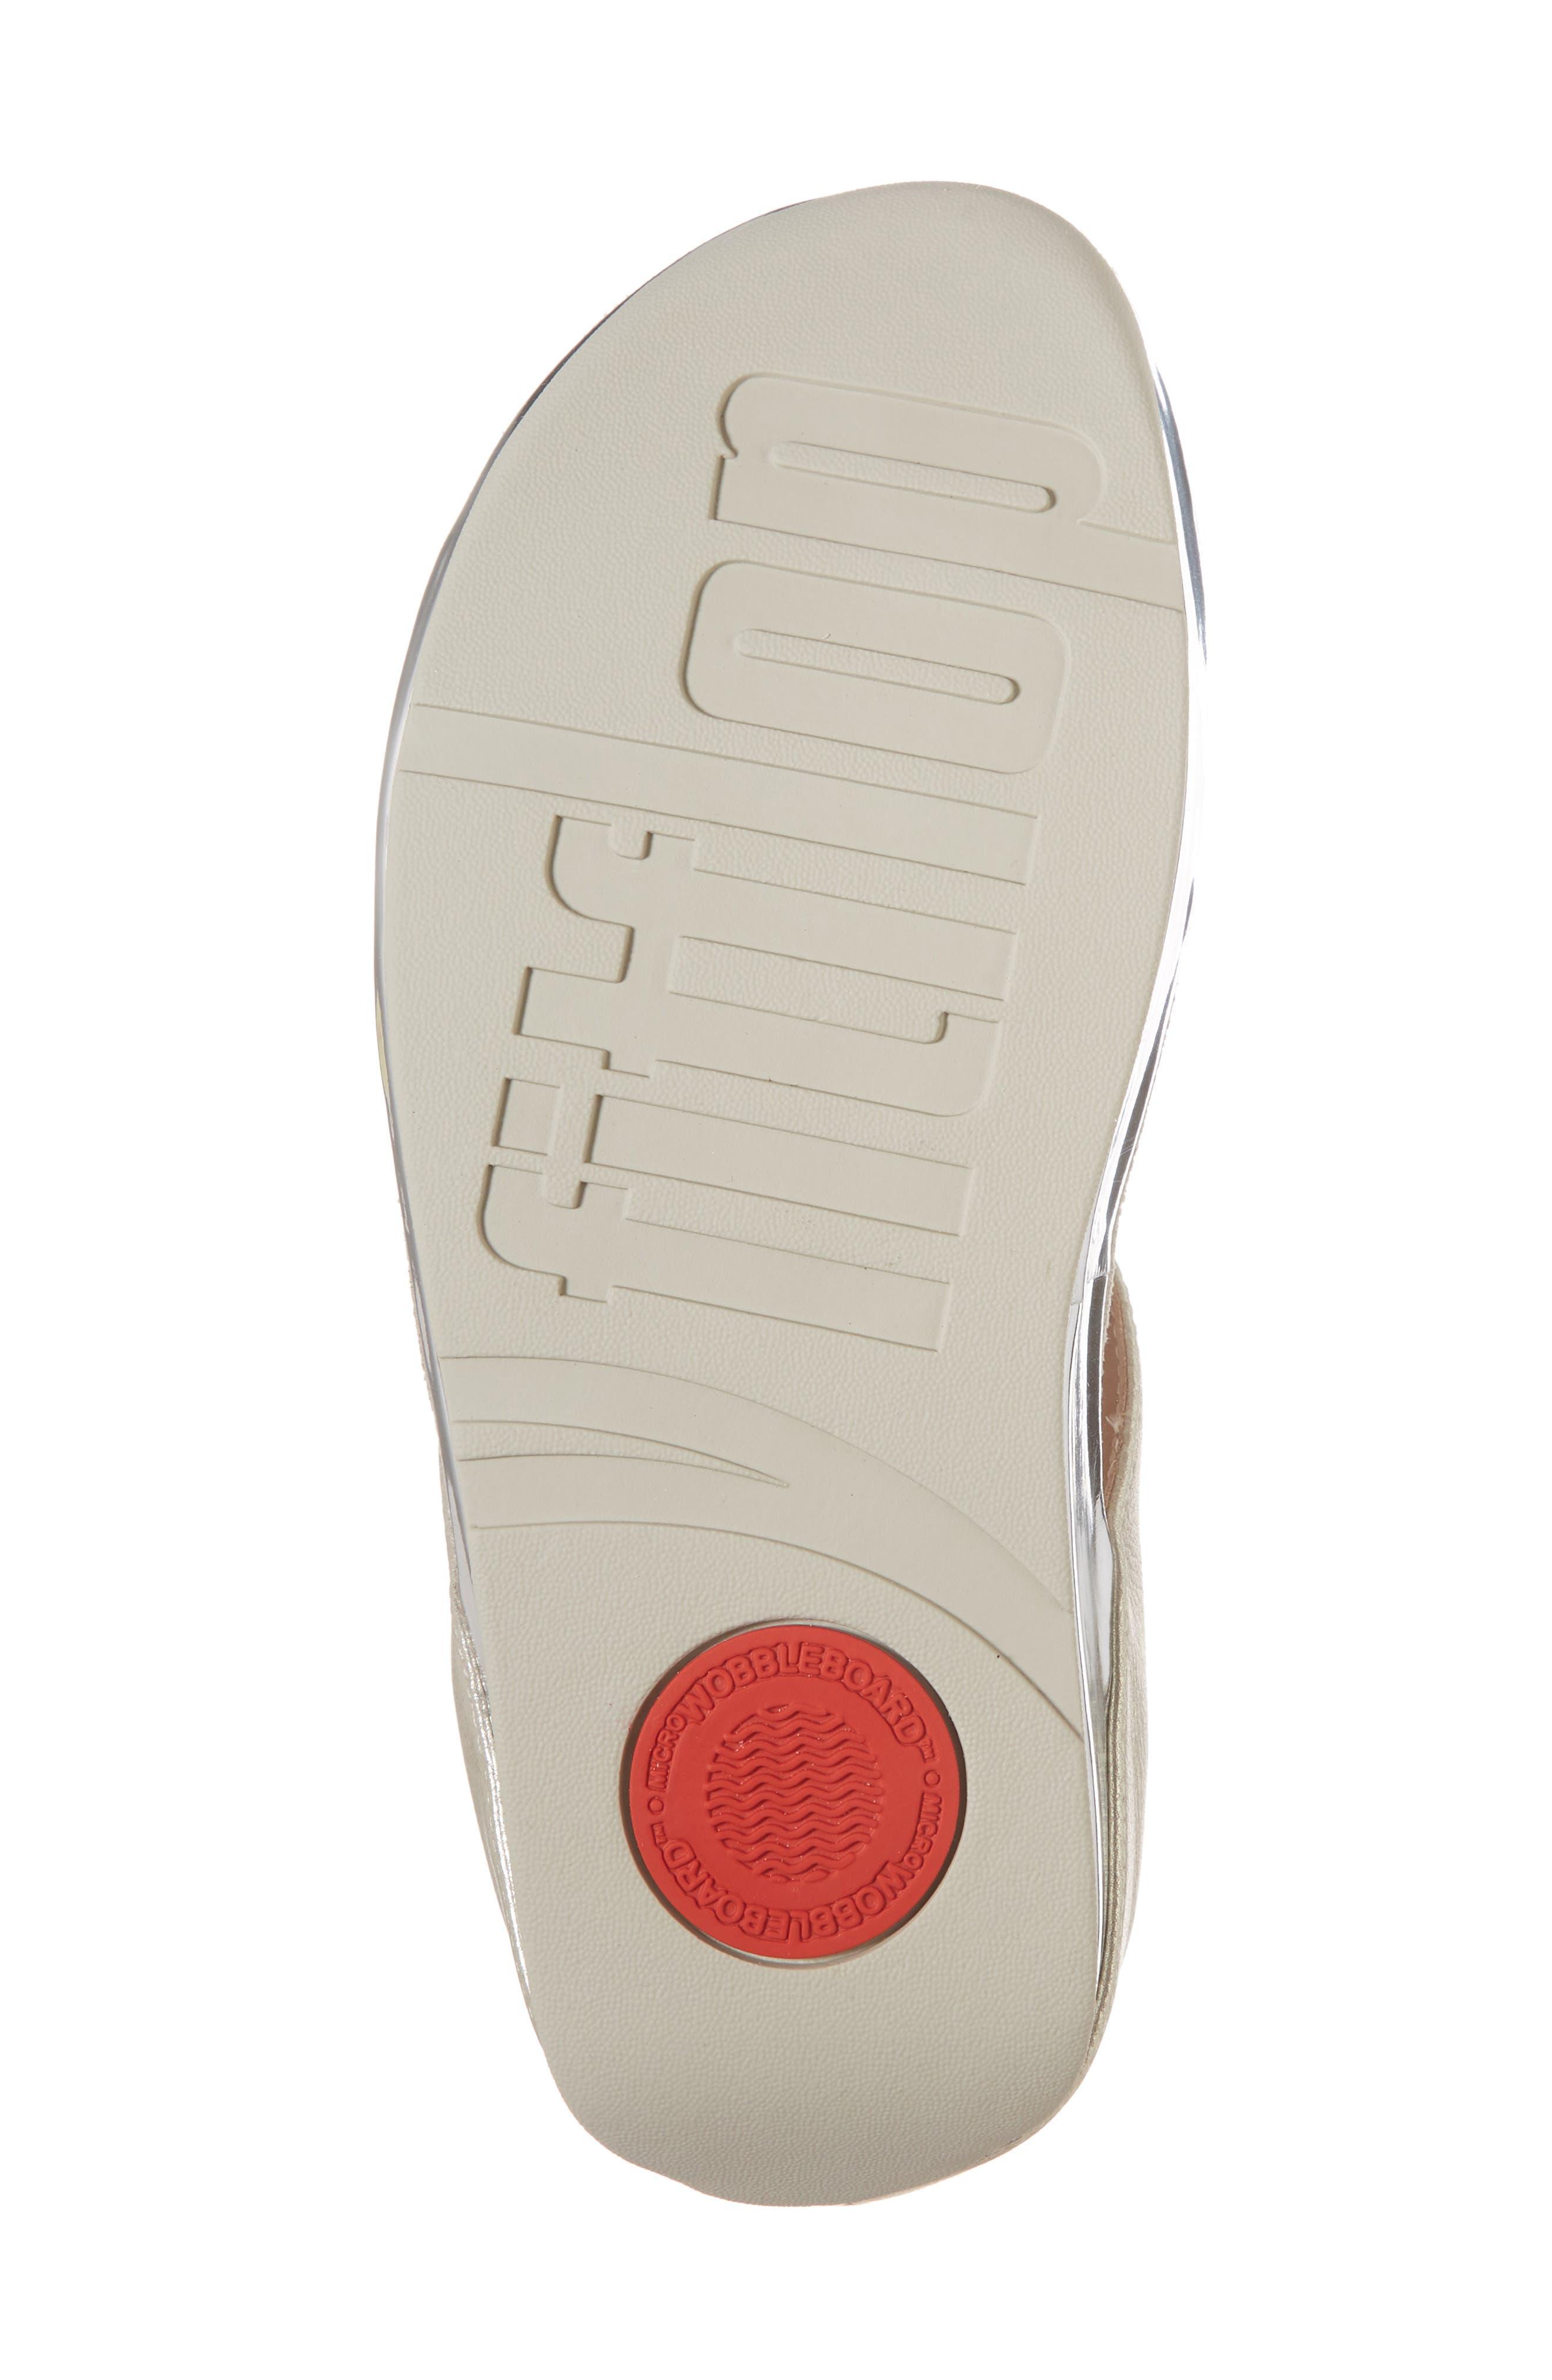 Rumba Flip Flop,                             Alternate thumbnail 6, color,                             Metallic Silver Leather